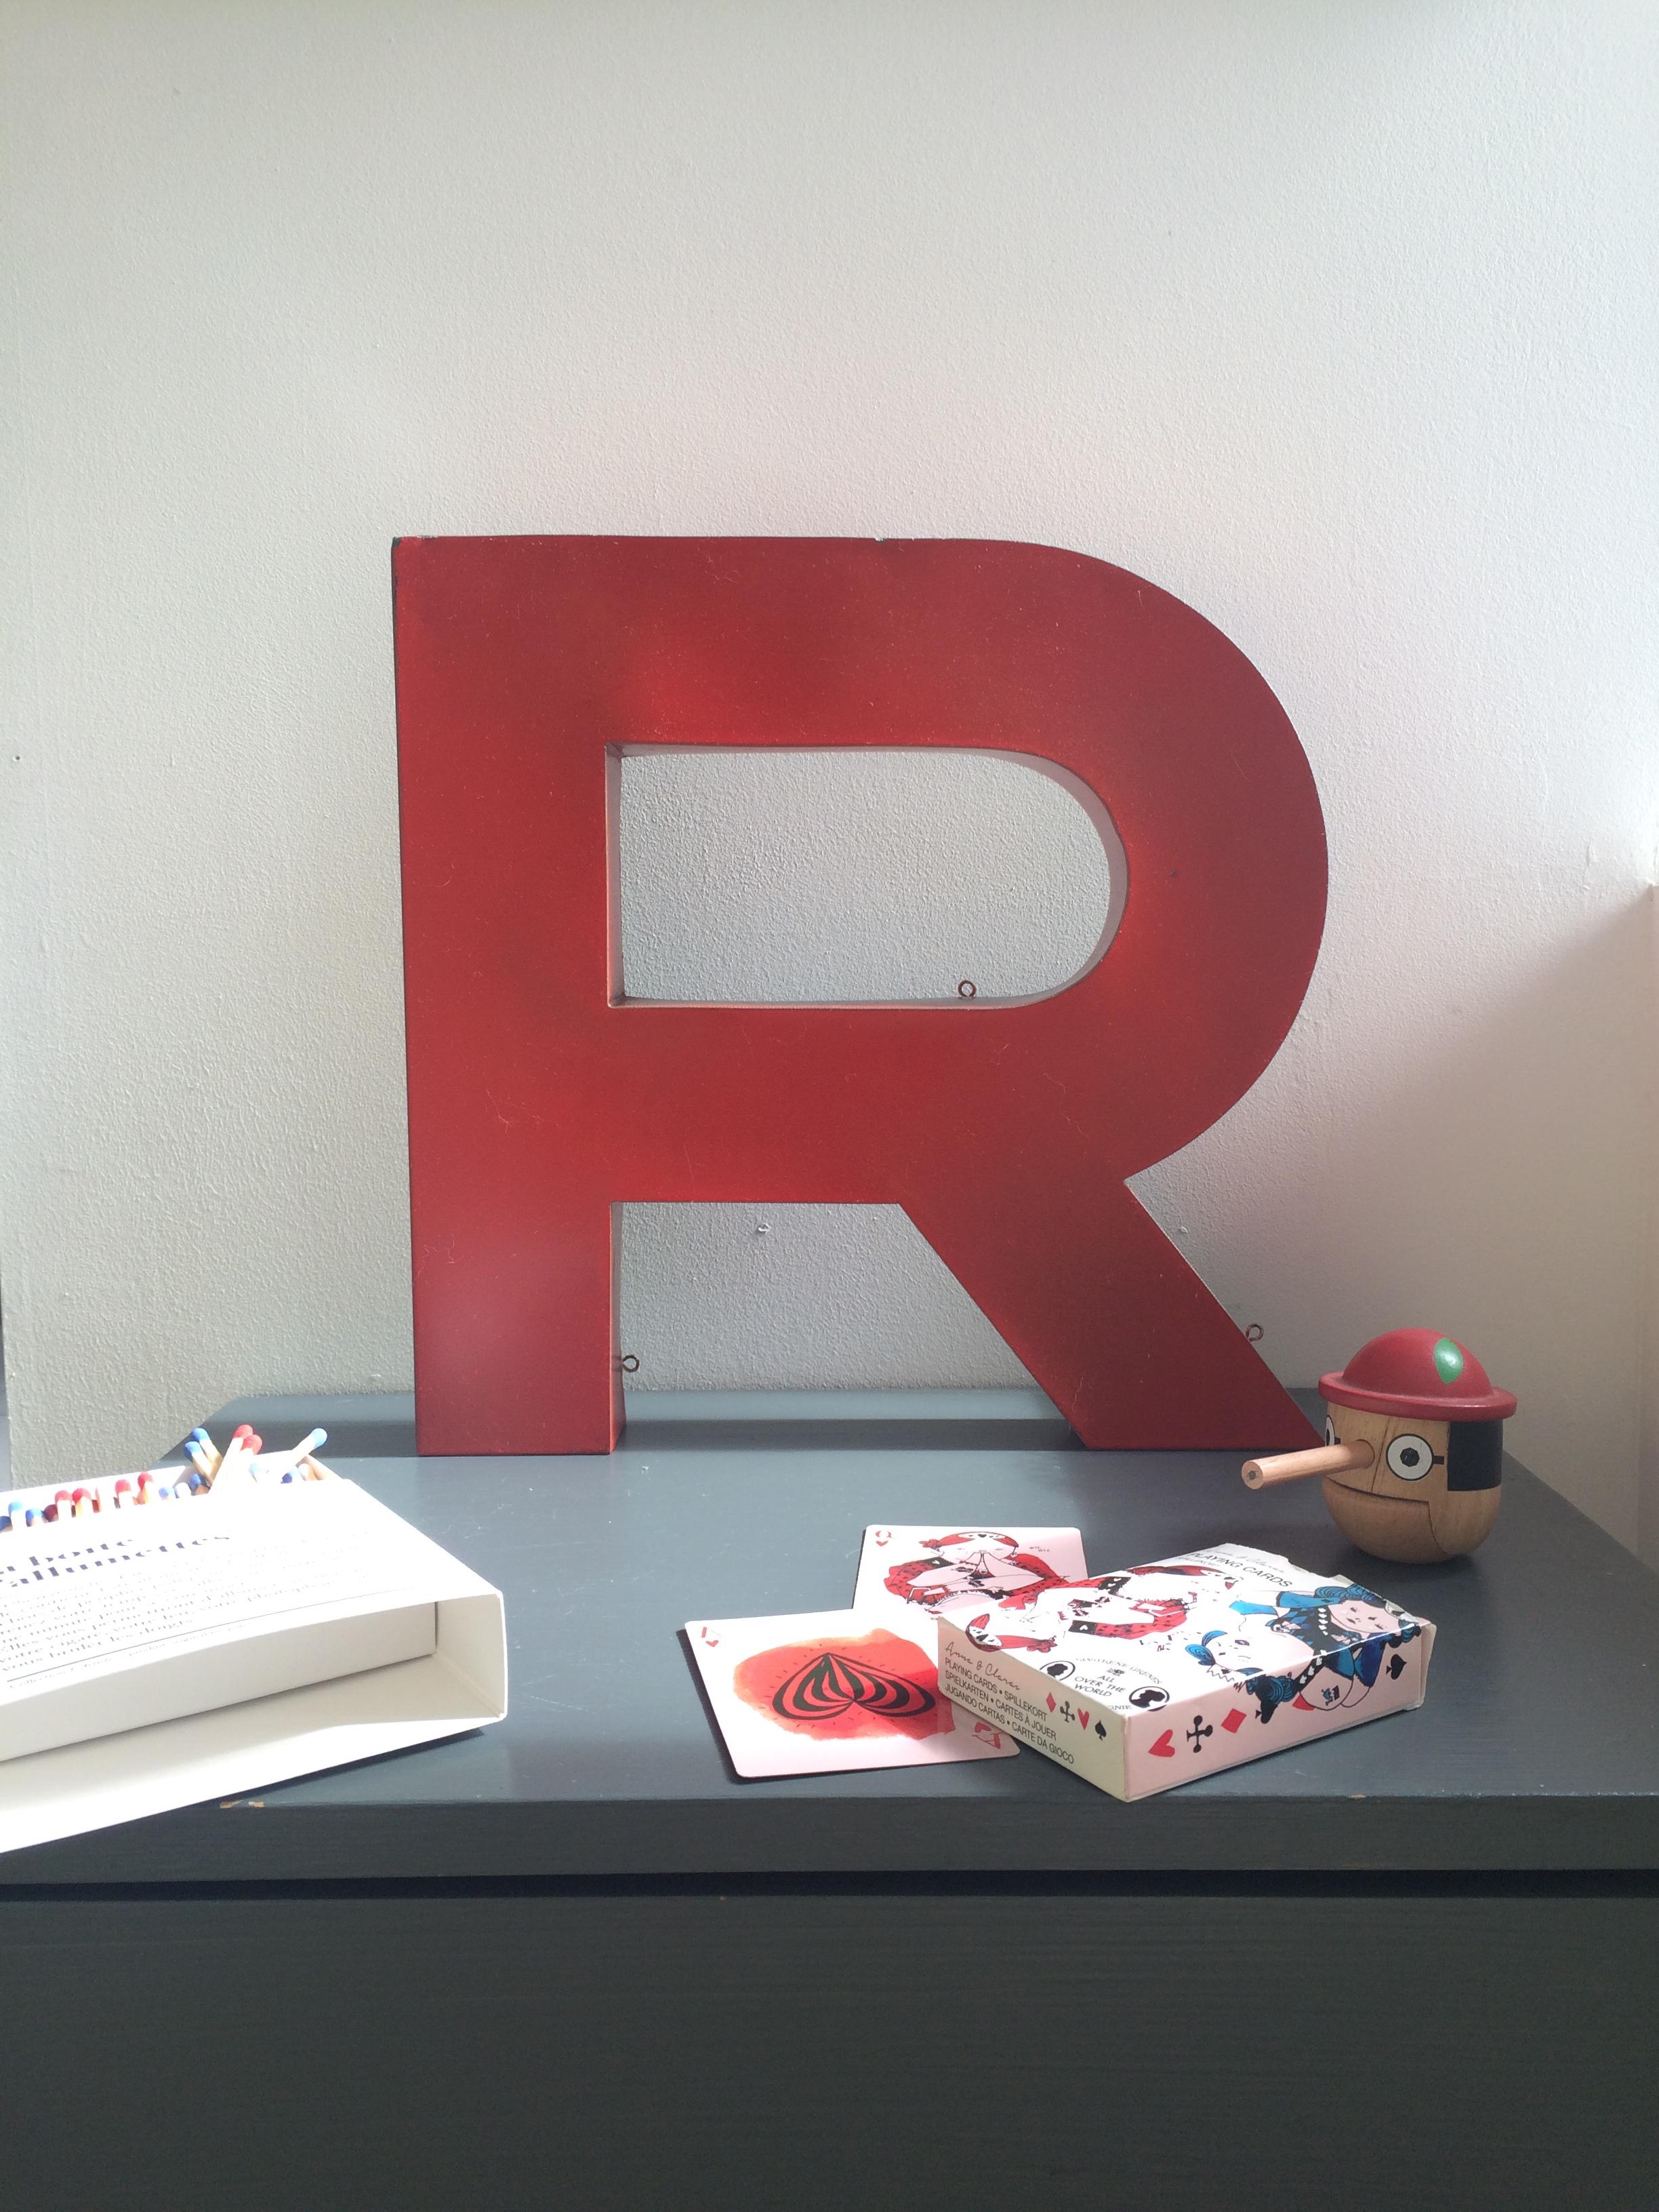 lettre d 39 enseigne rouge r vintage magic. Black Bedroom Furniture Sets. Home Design Ideas